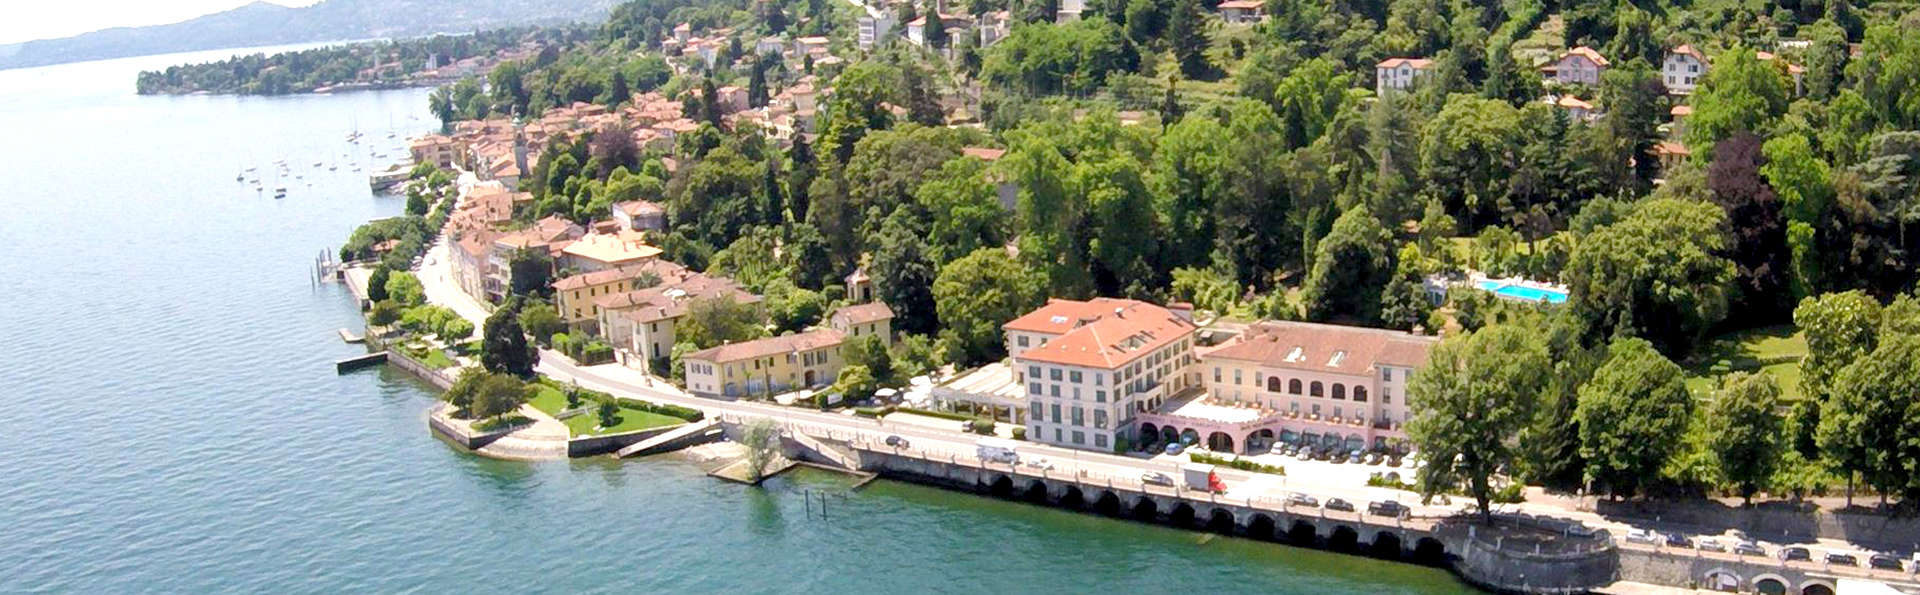 SHG Hotel Villa Carlotta - Edit_View2.jpg